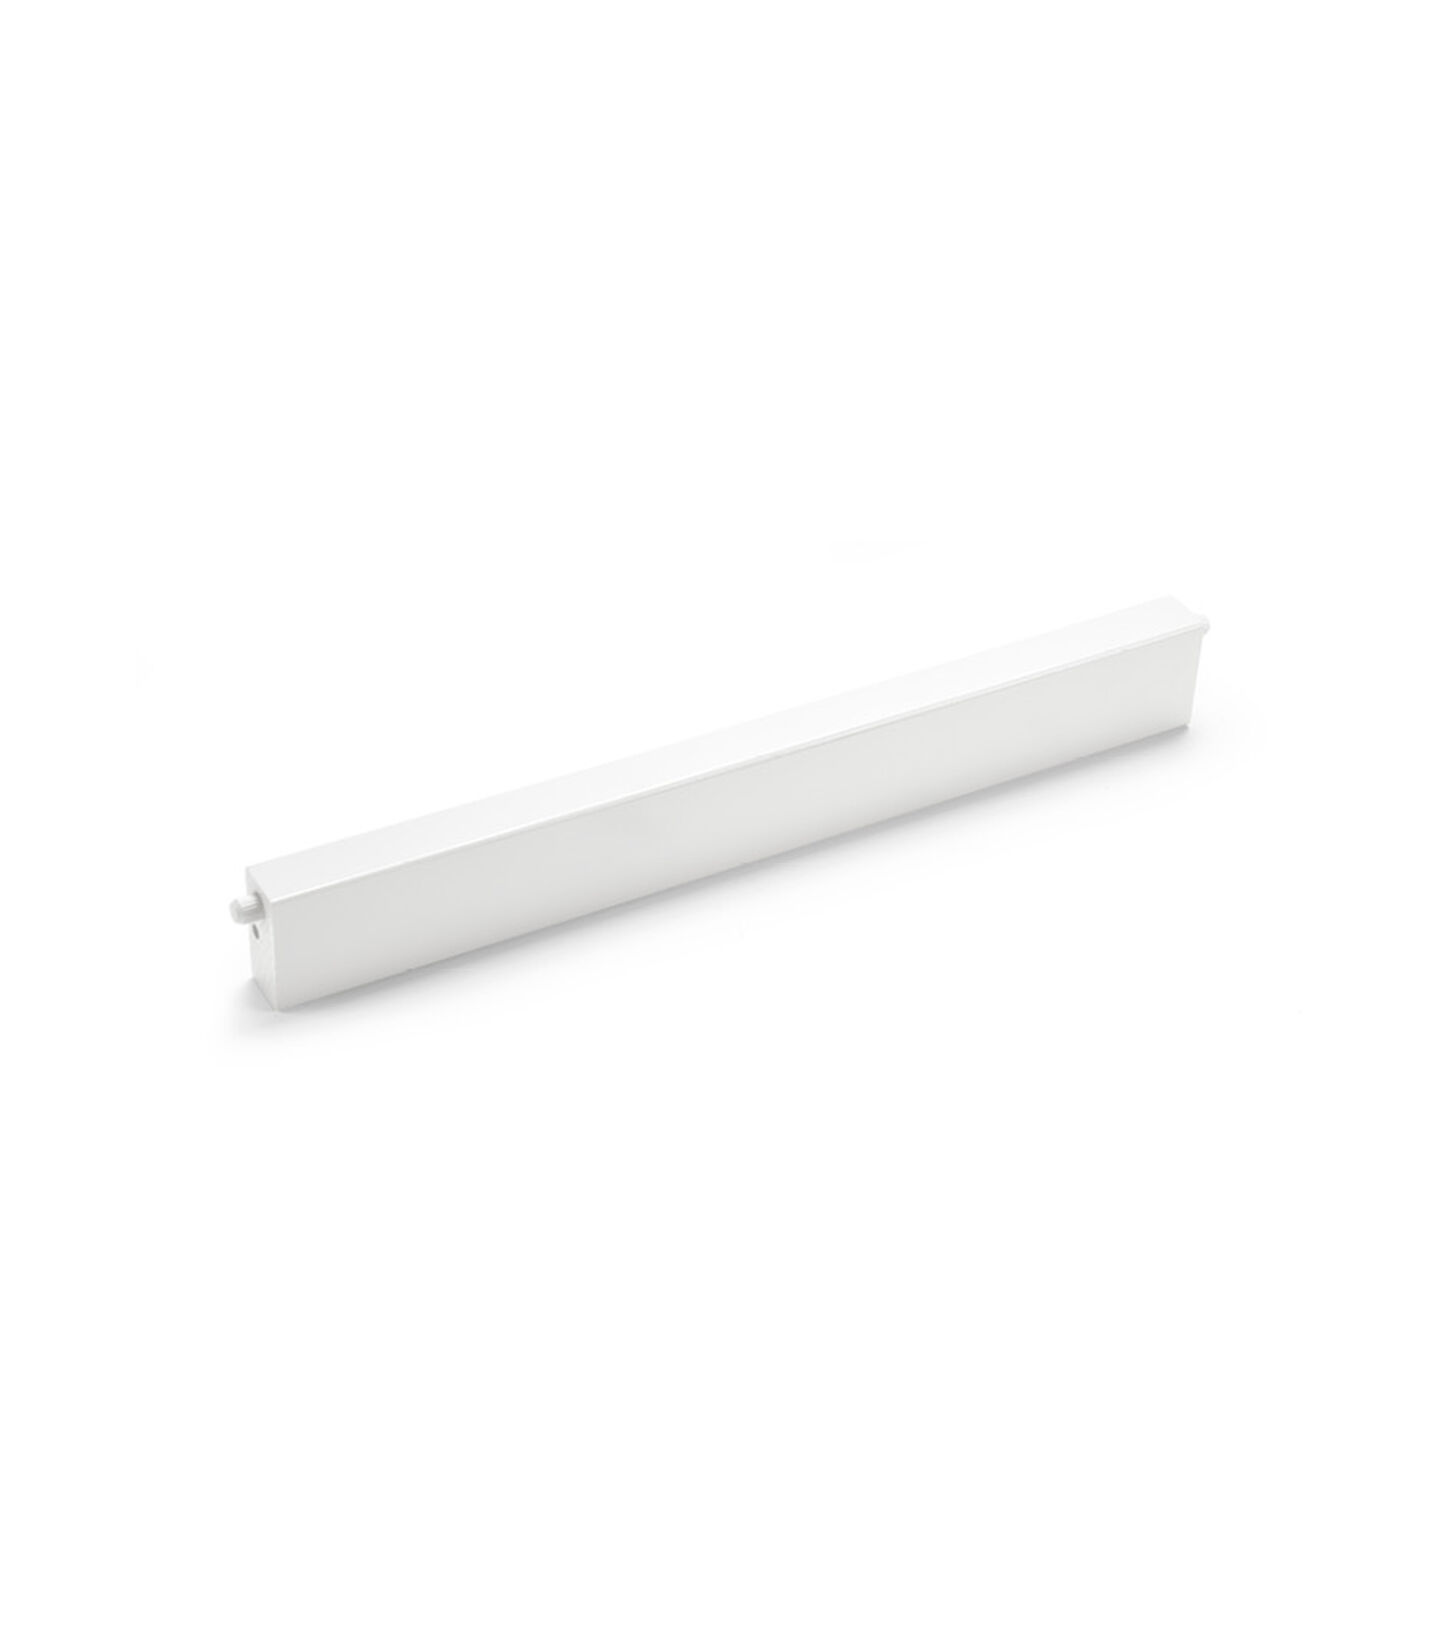 Tripp Trapp® Floorbrace Bianco, Bianco, mainview view 2